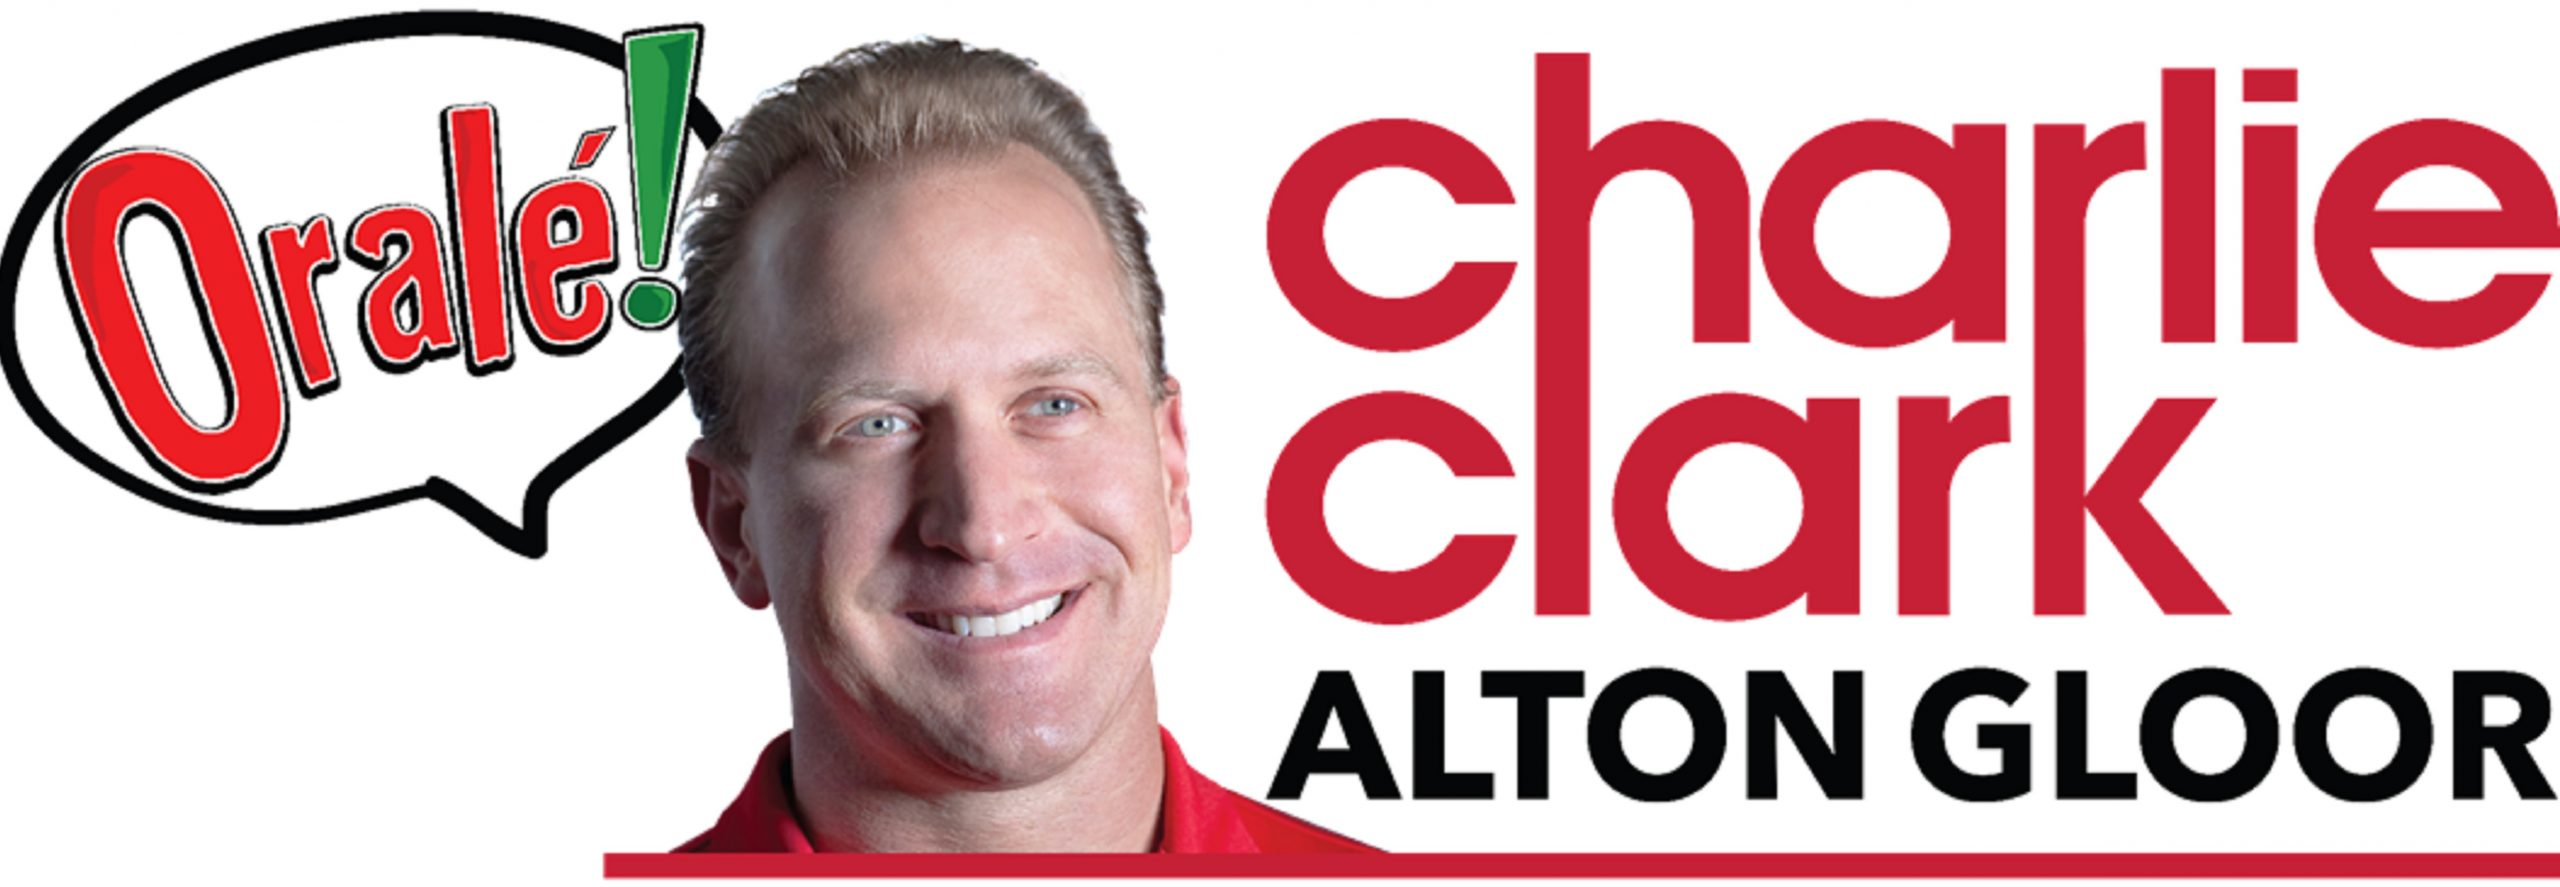 Charlie Clark Alton Gloor